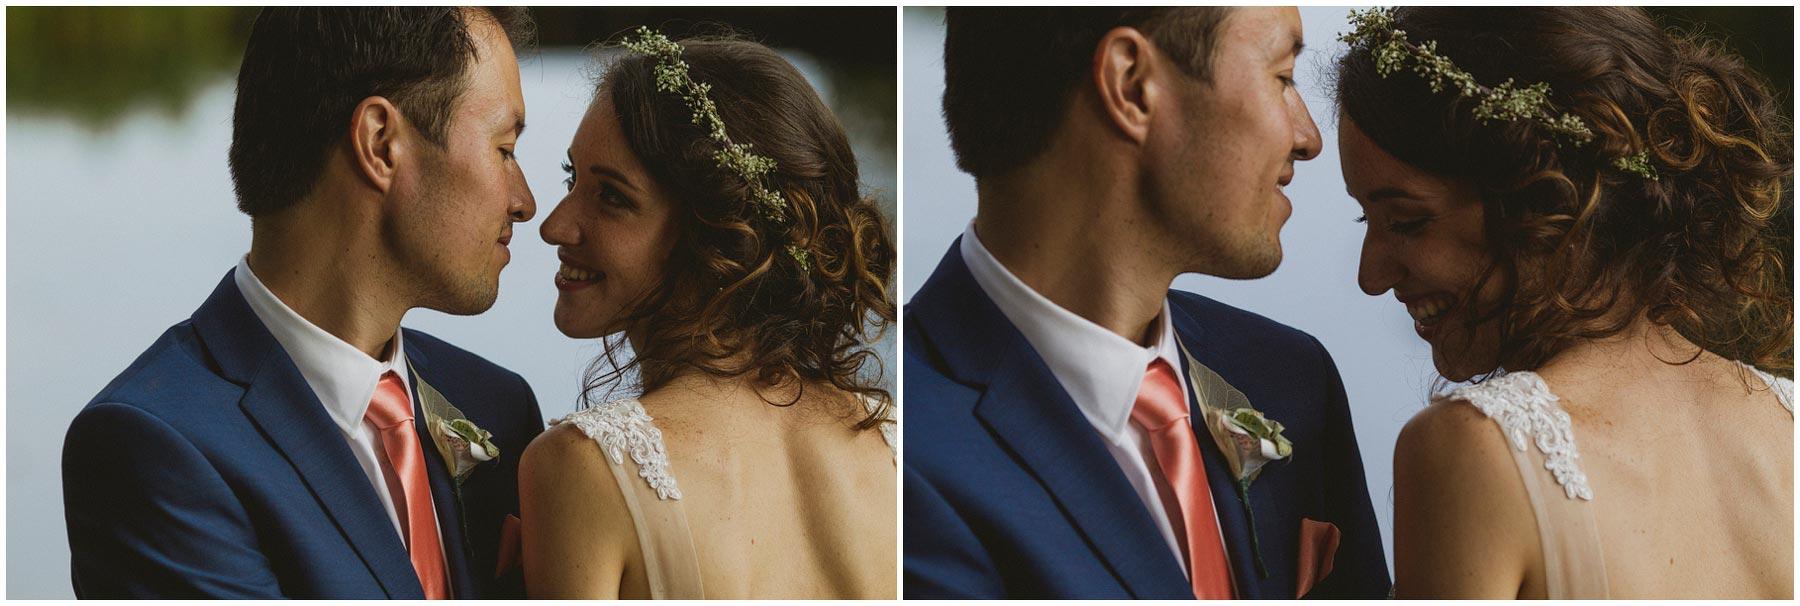 Colehayes-Park-Wedding-Photography_0130